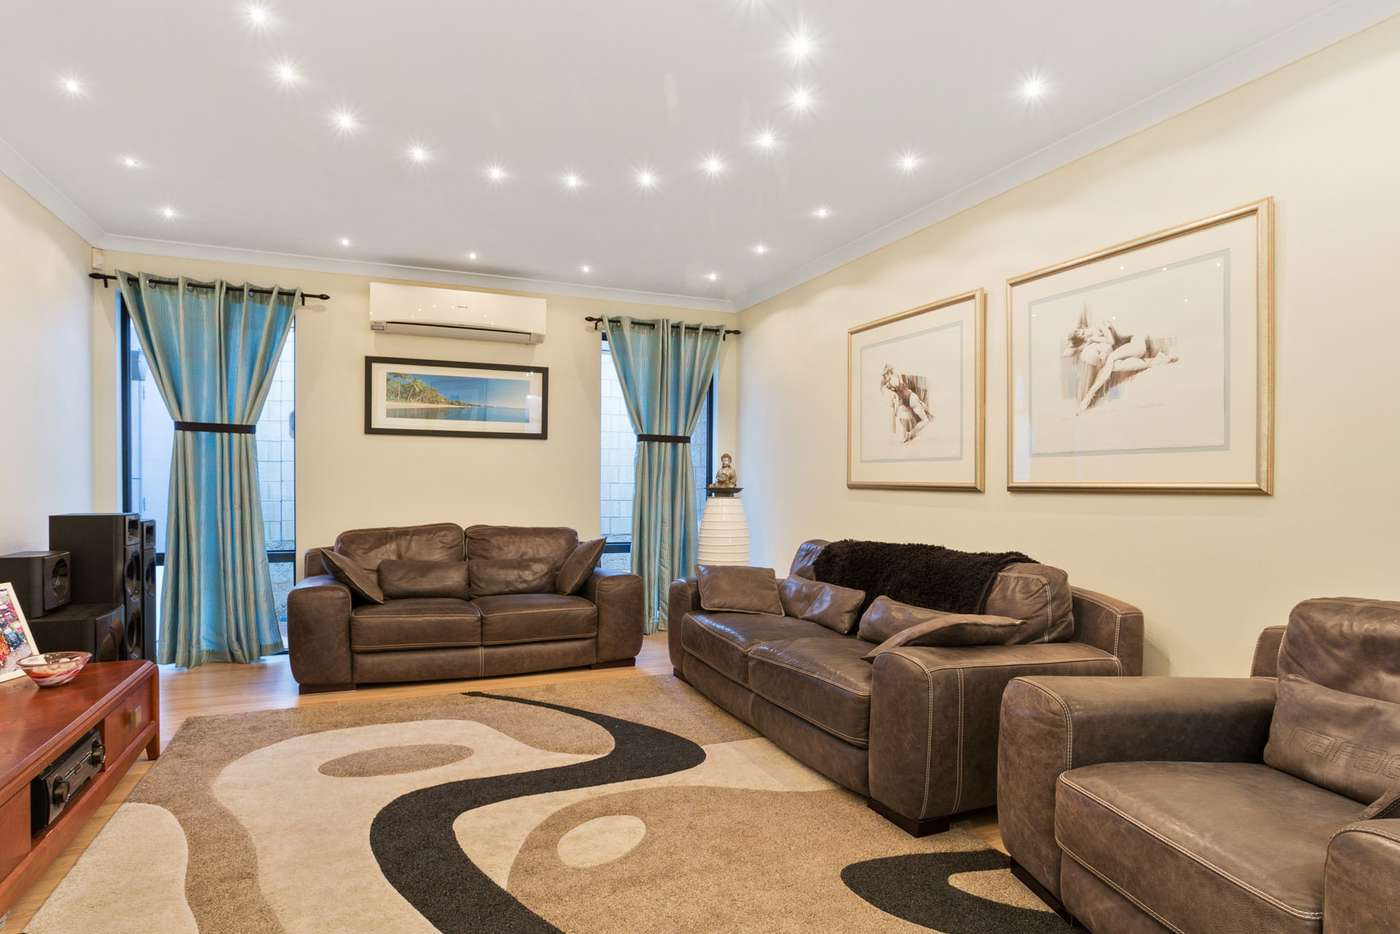 Sixth view of Homely house listing, 22 Gordona Parade, Beeliar WA 6164